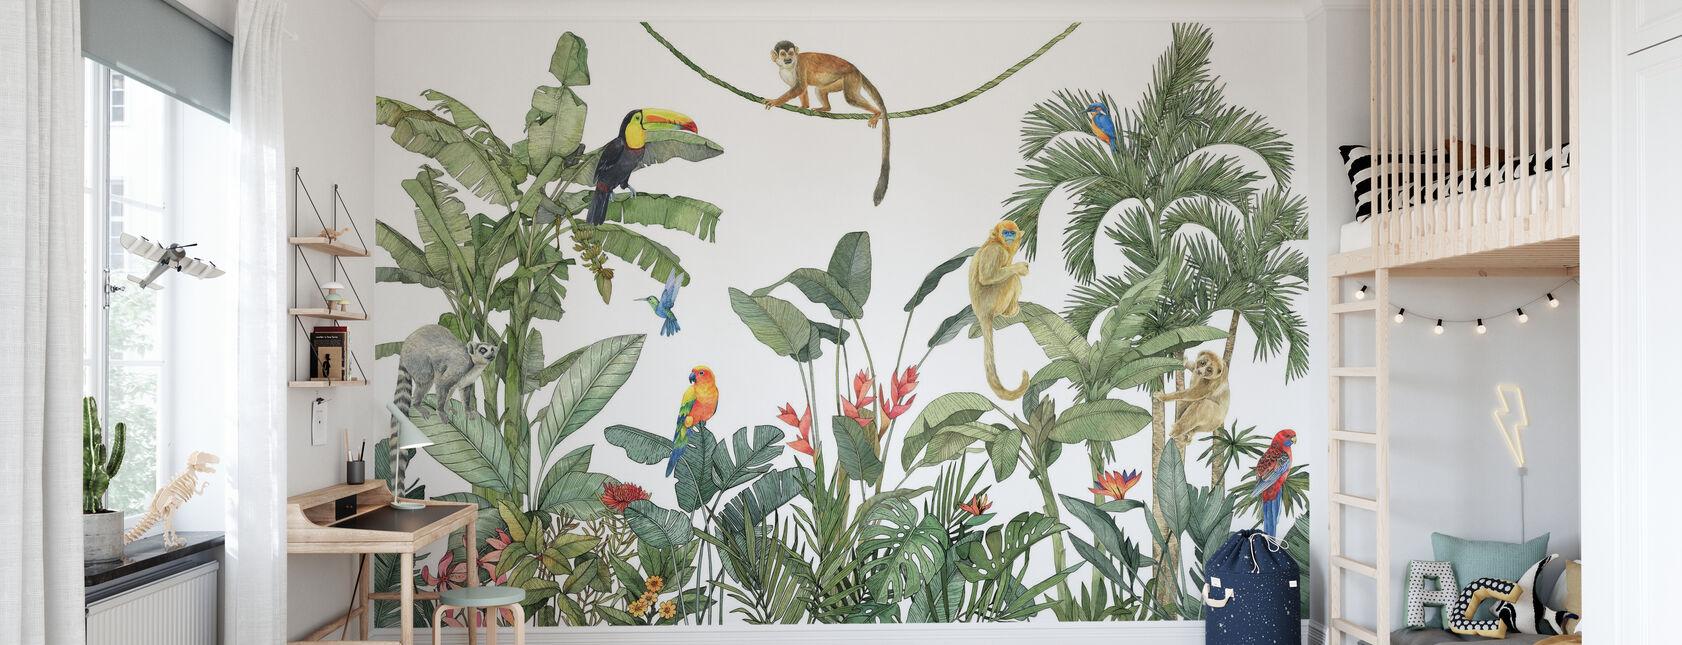 In Harmony - Wallpaper - Kids Room